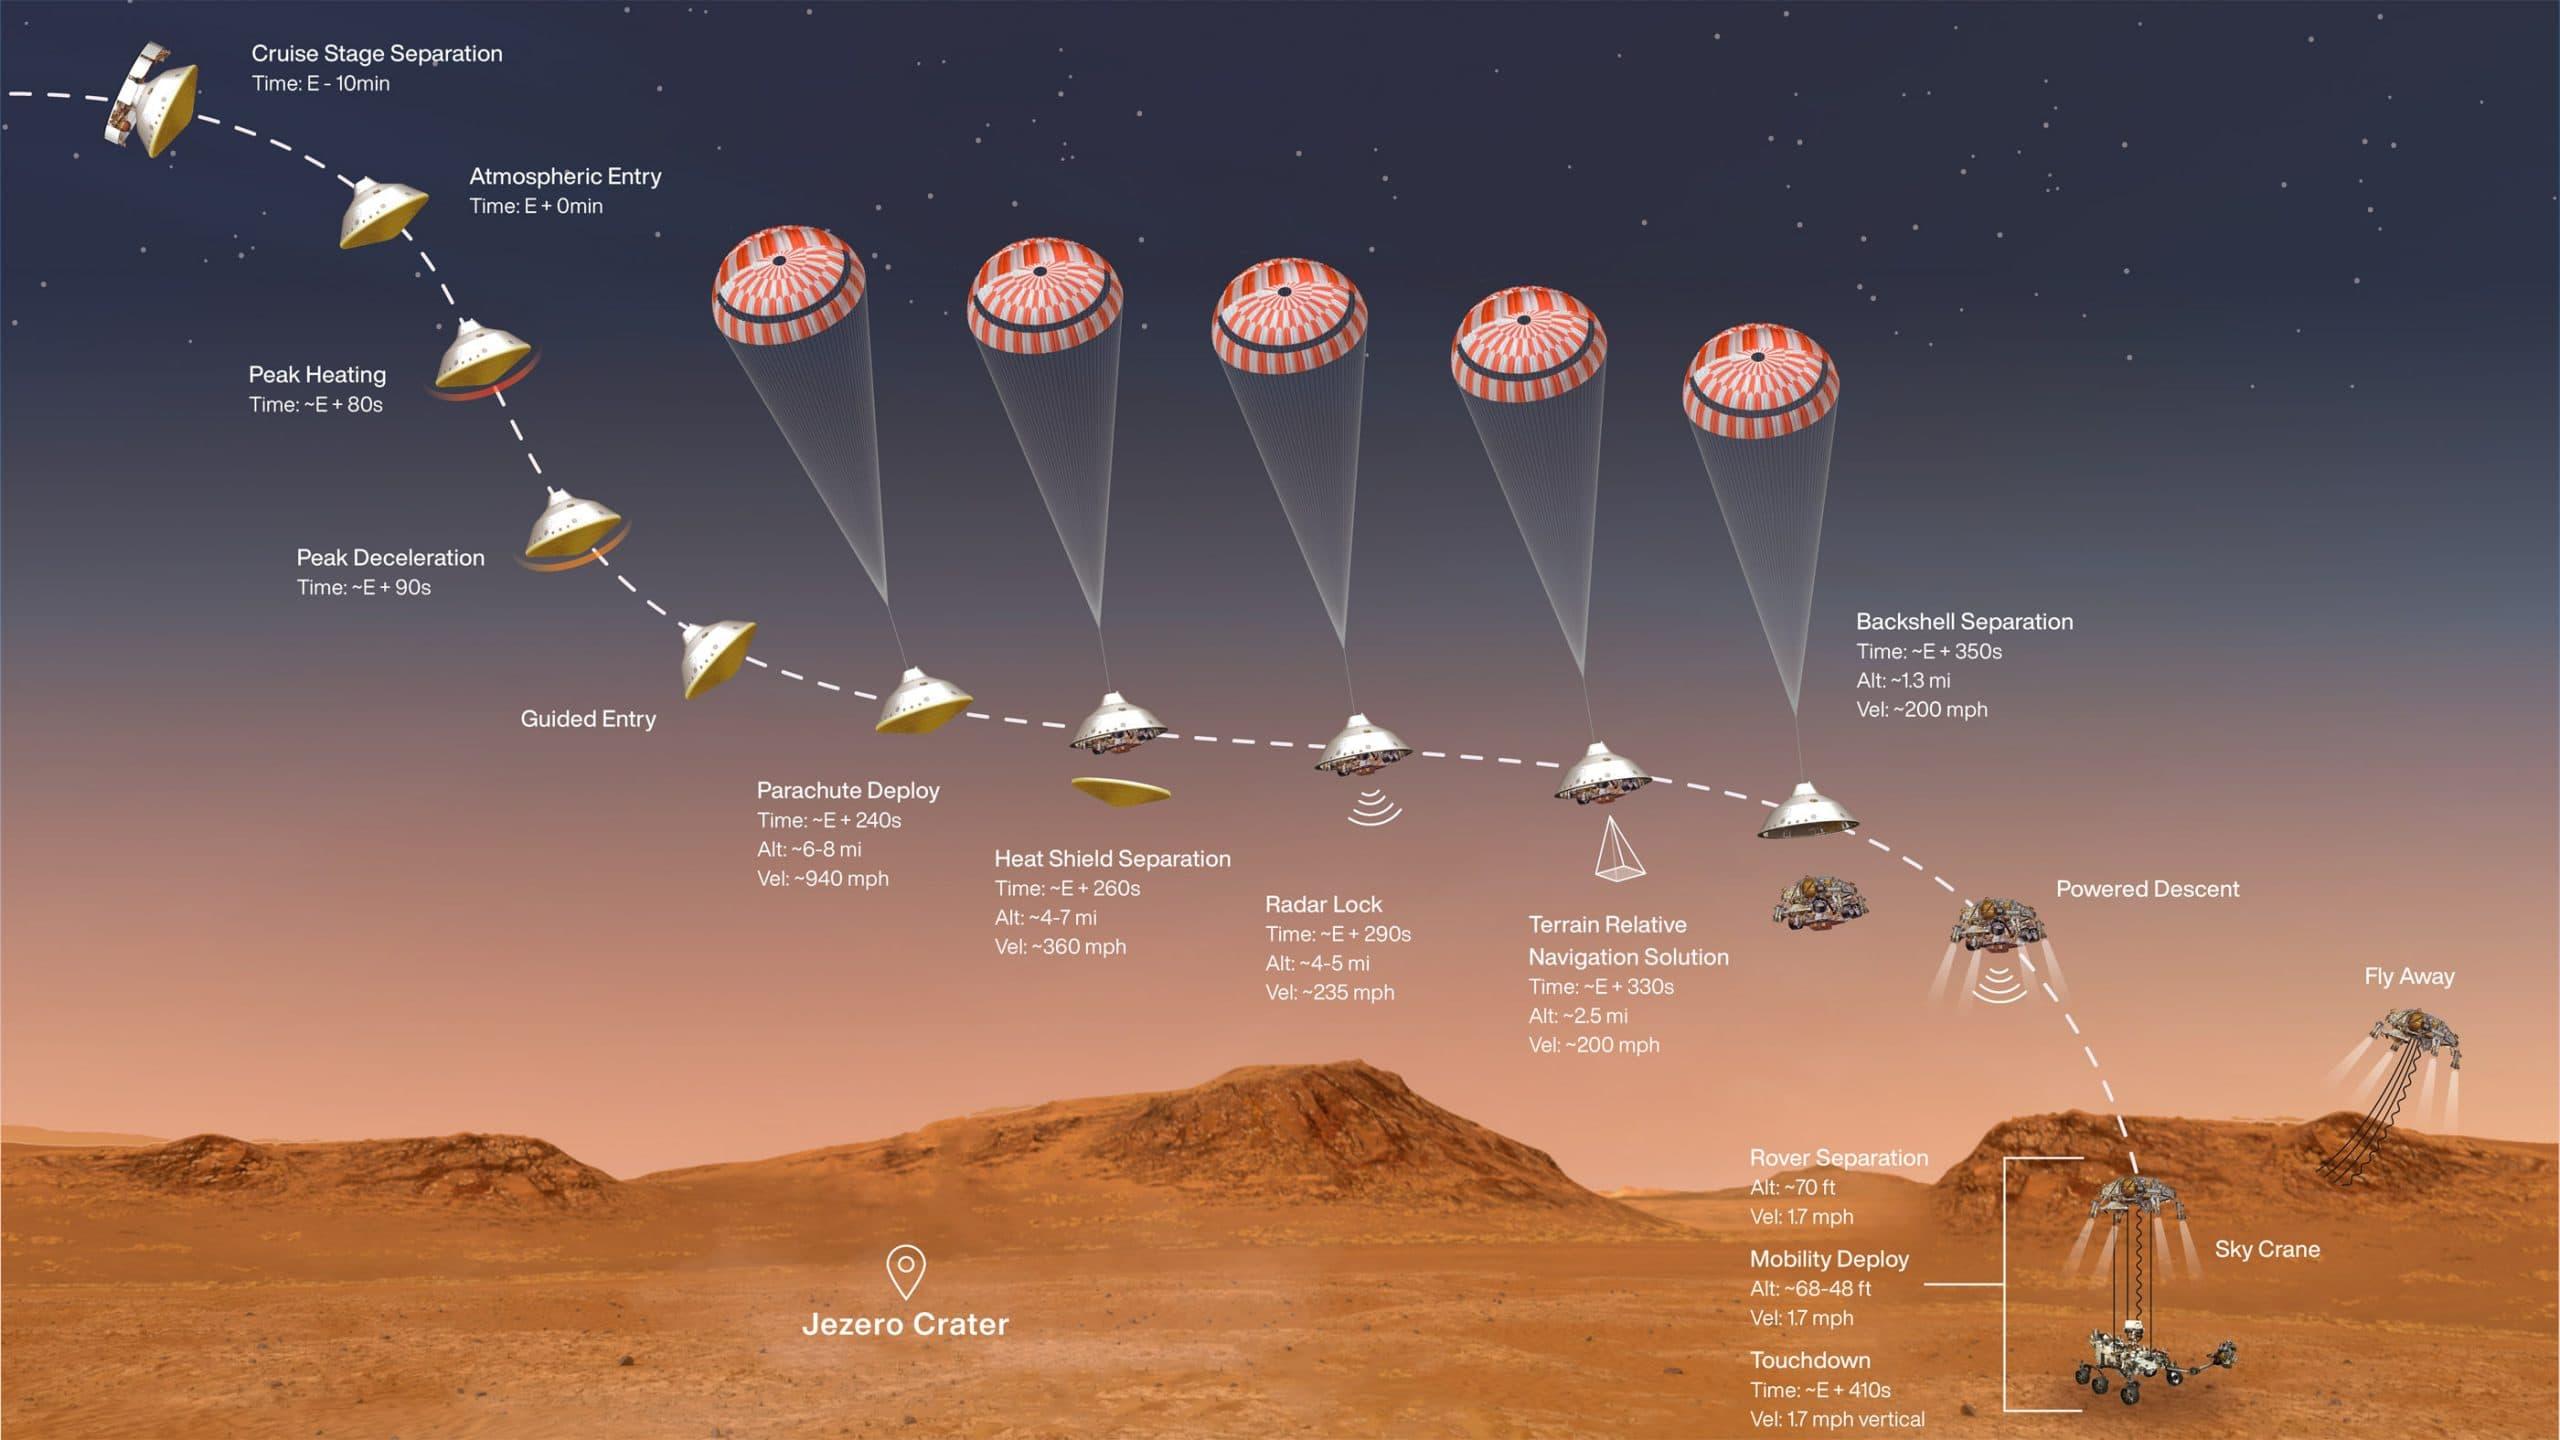 Perseverance посадка на Марс